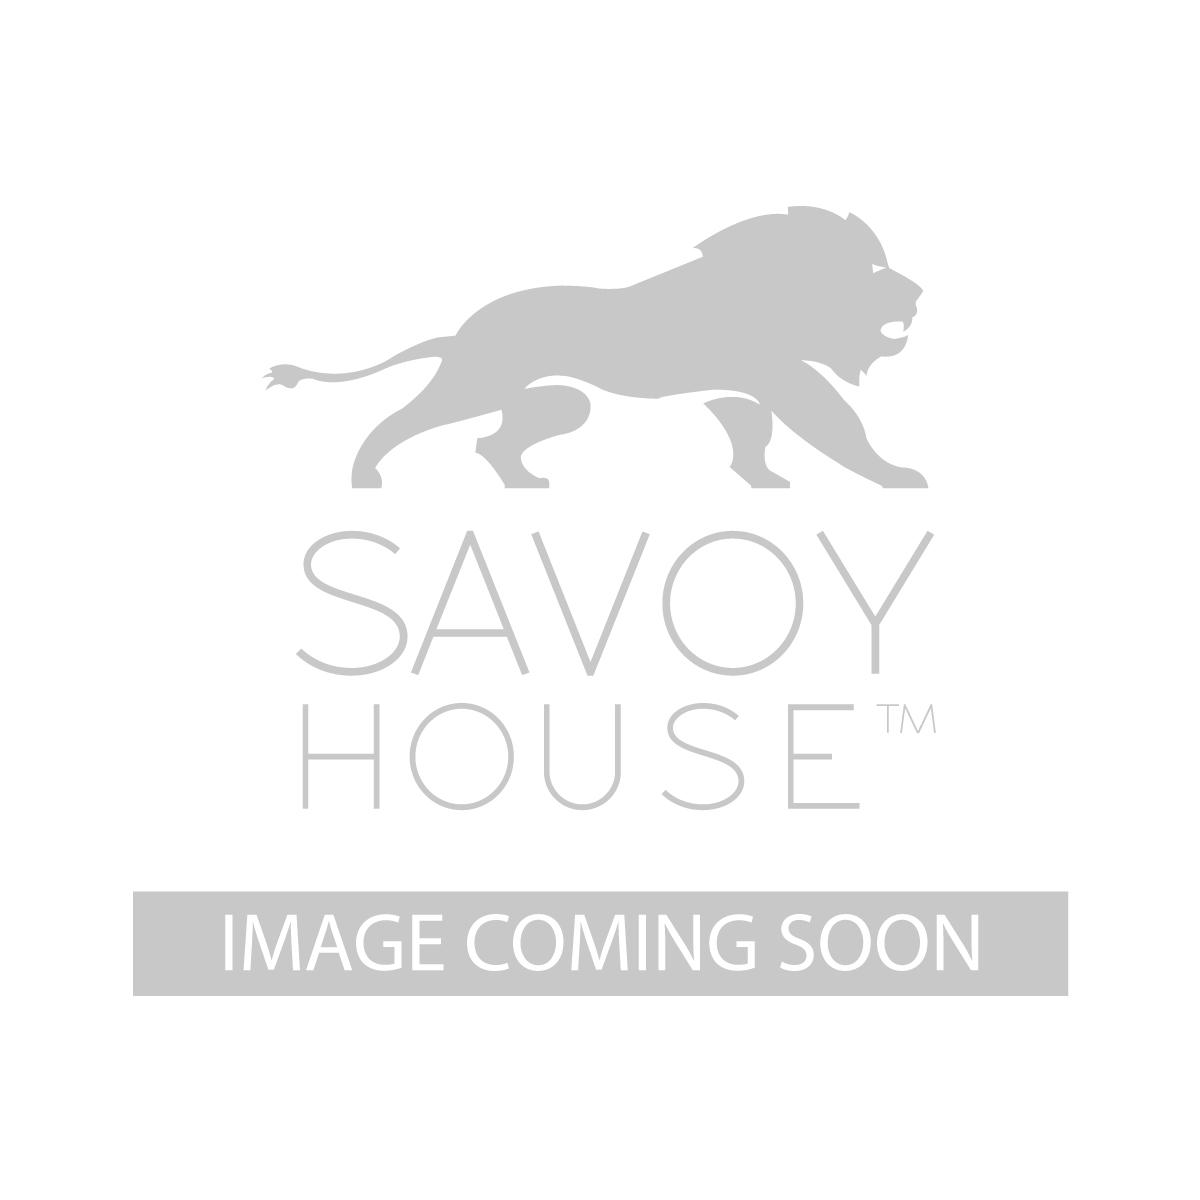 1 7001 12 77 lyrique 12 light chandelier by savoy house lyrique 12 light chandelier aloadofball Gallery